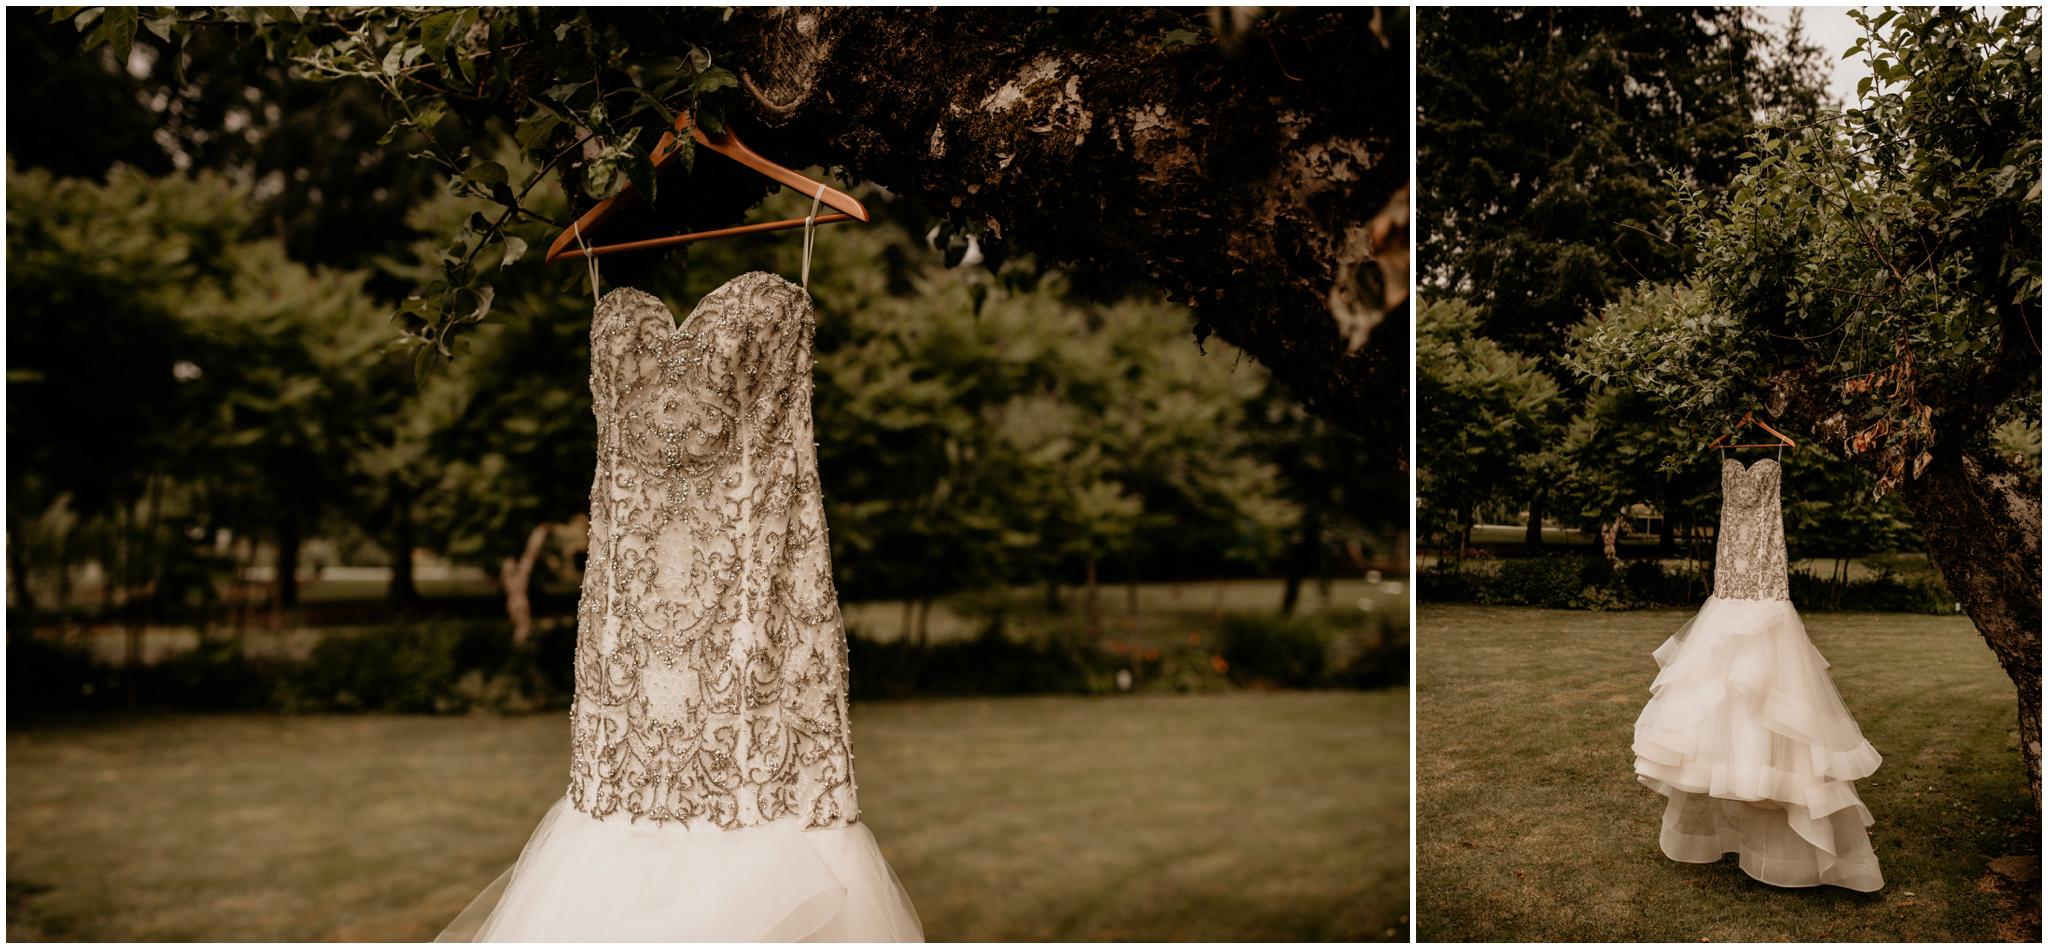 alex-and-matthew-three-cs-farm-venue-seattle-wedding-photographer-002.jpg